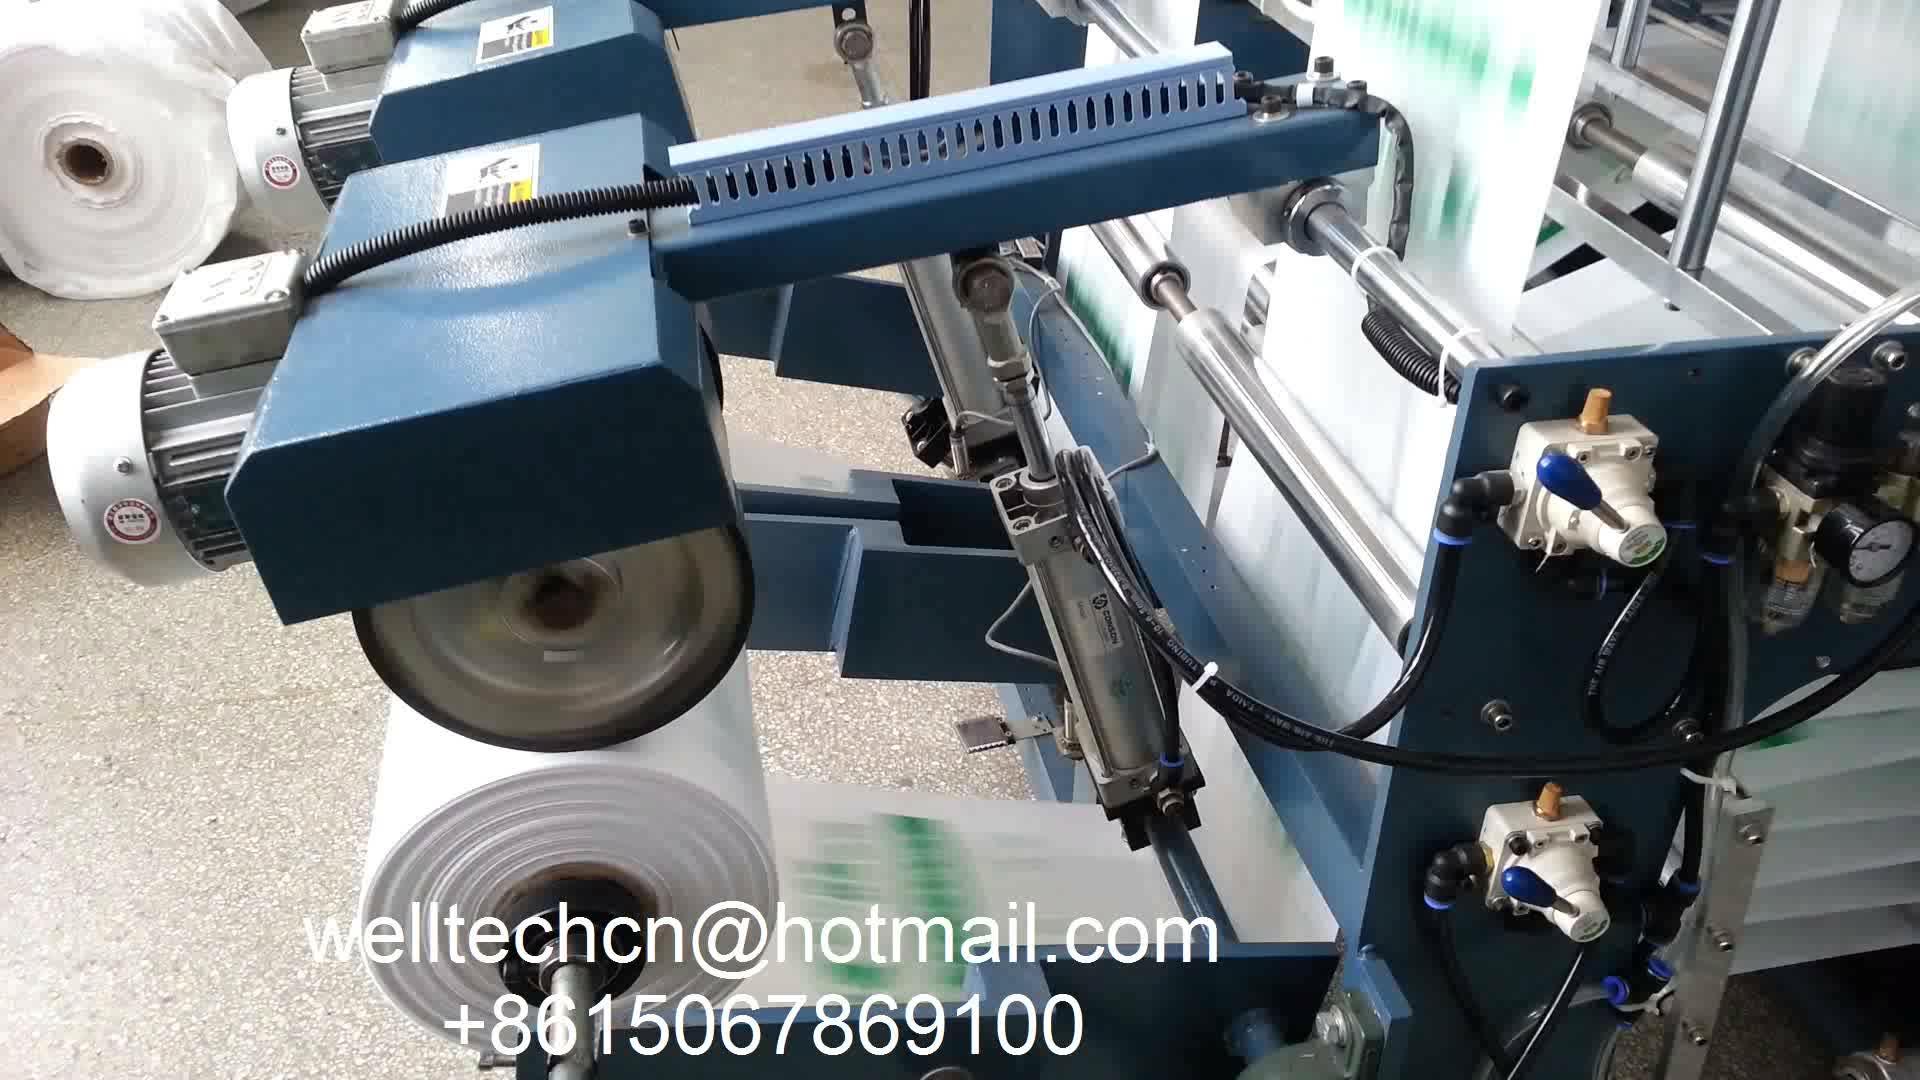 Best Sealing And Cutting Machine Small Shopping Plastic T-shirt Bag Making Machine Price